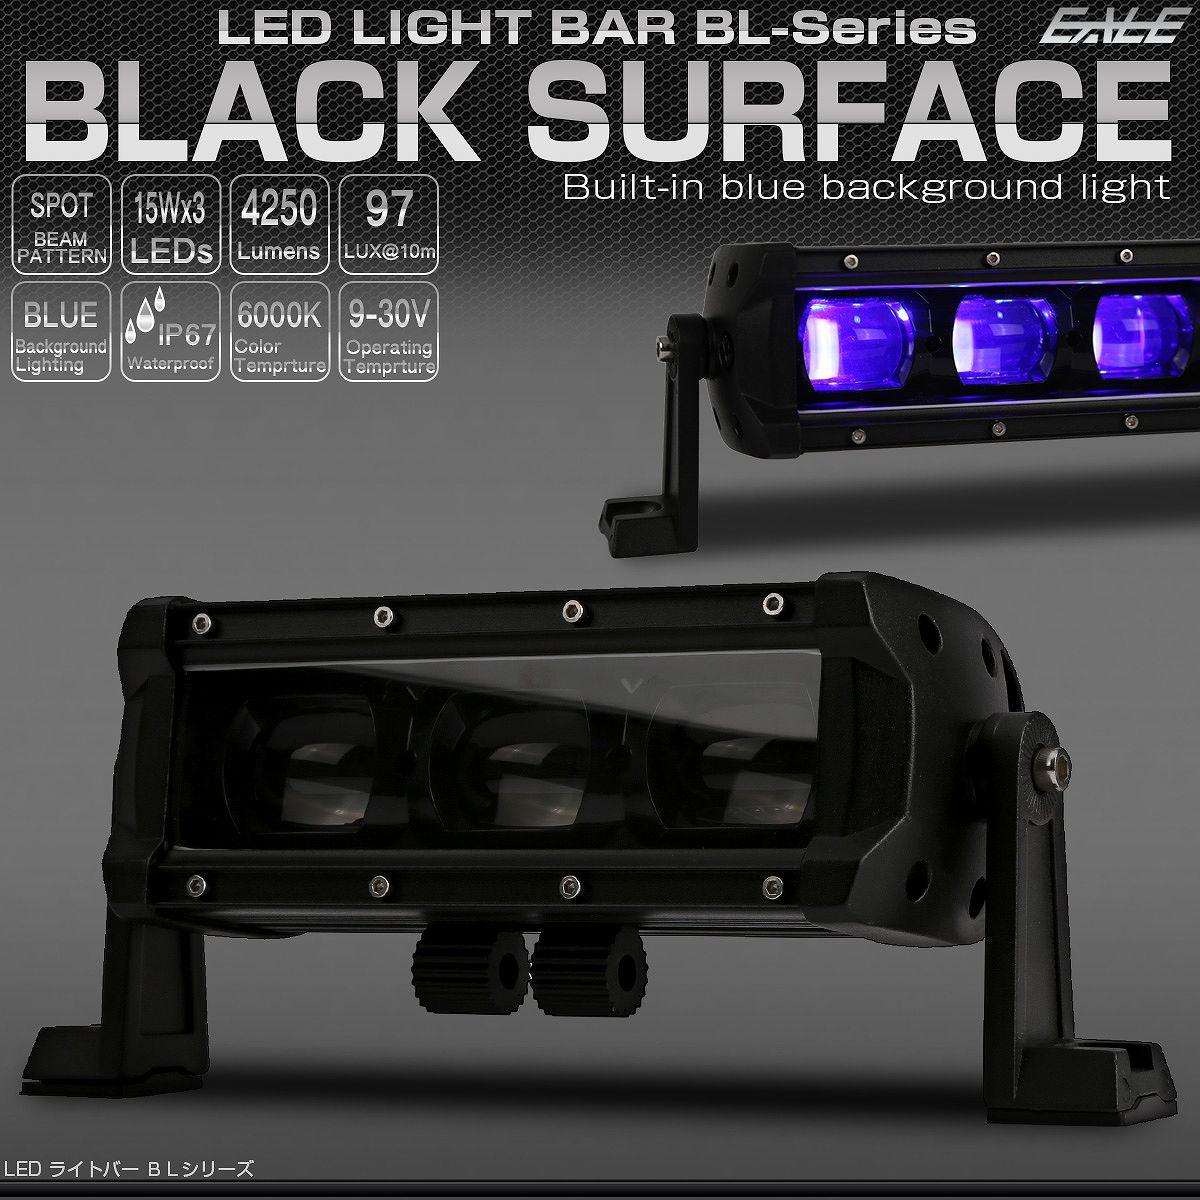 LEDライトバー 作業灯 45W 7インチ ブルー バックライト内蔵 ブラックインナー スポット 4250ルーメン 12V 24V P-541